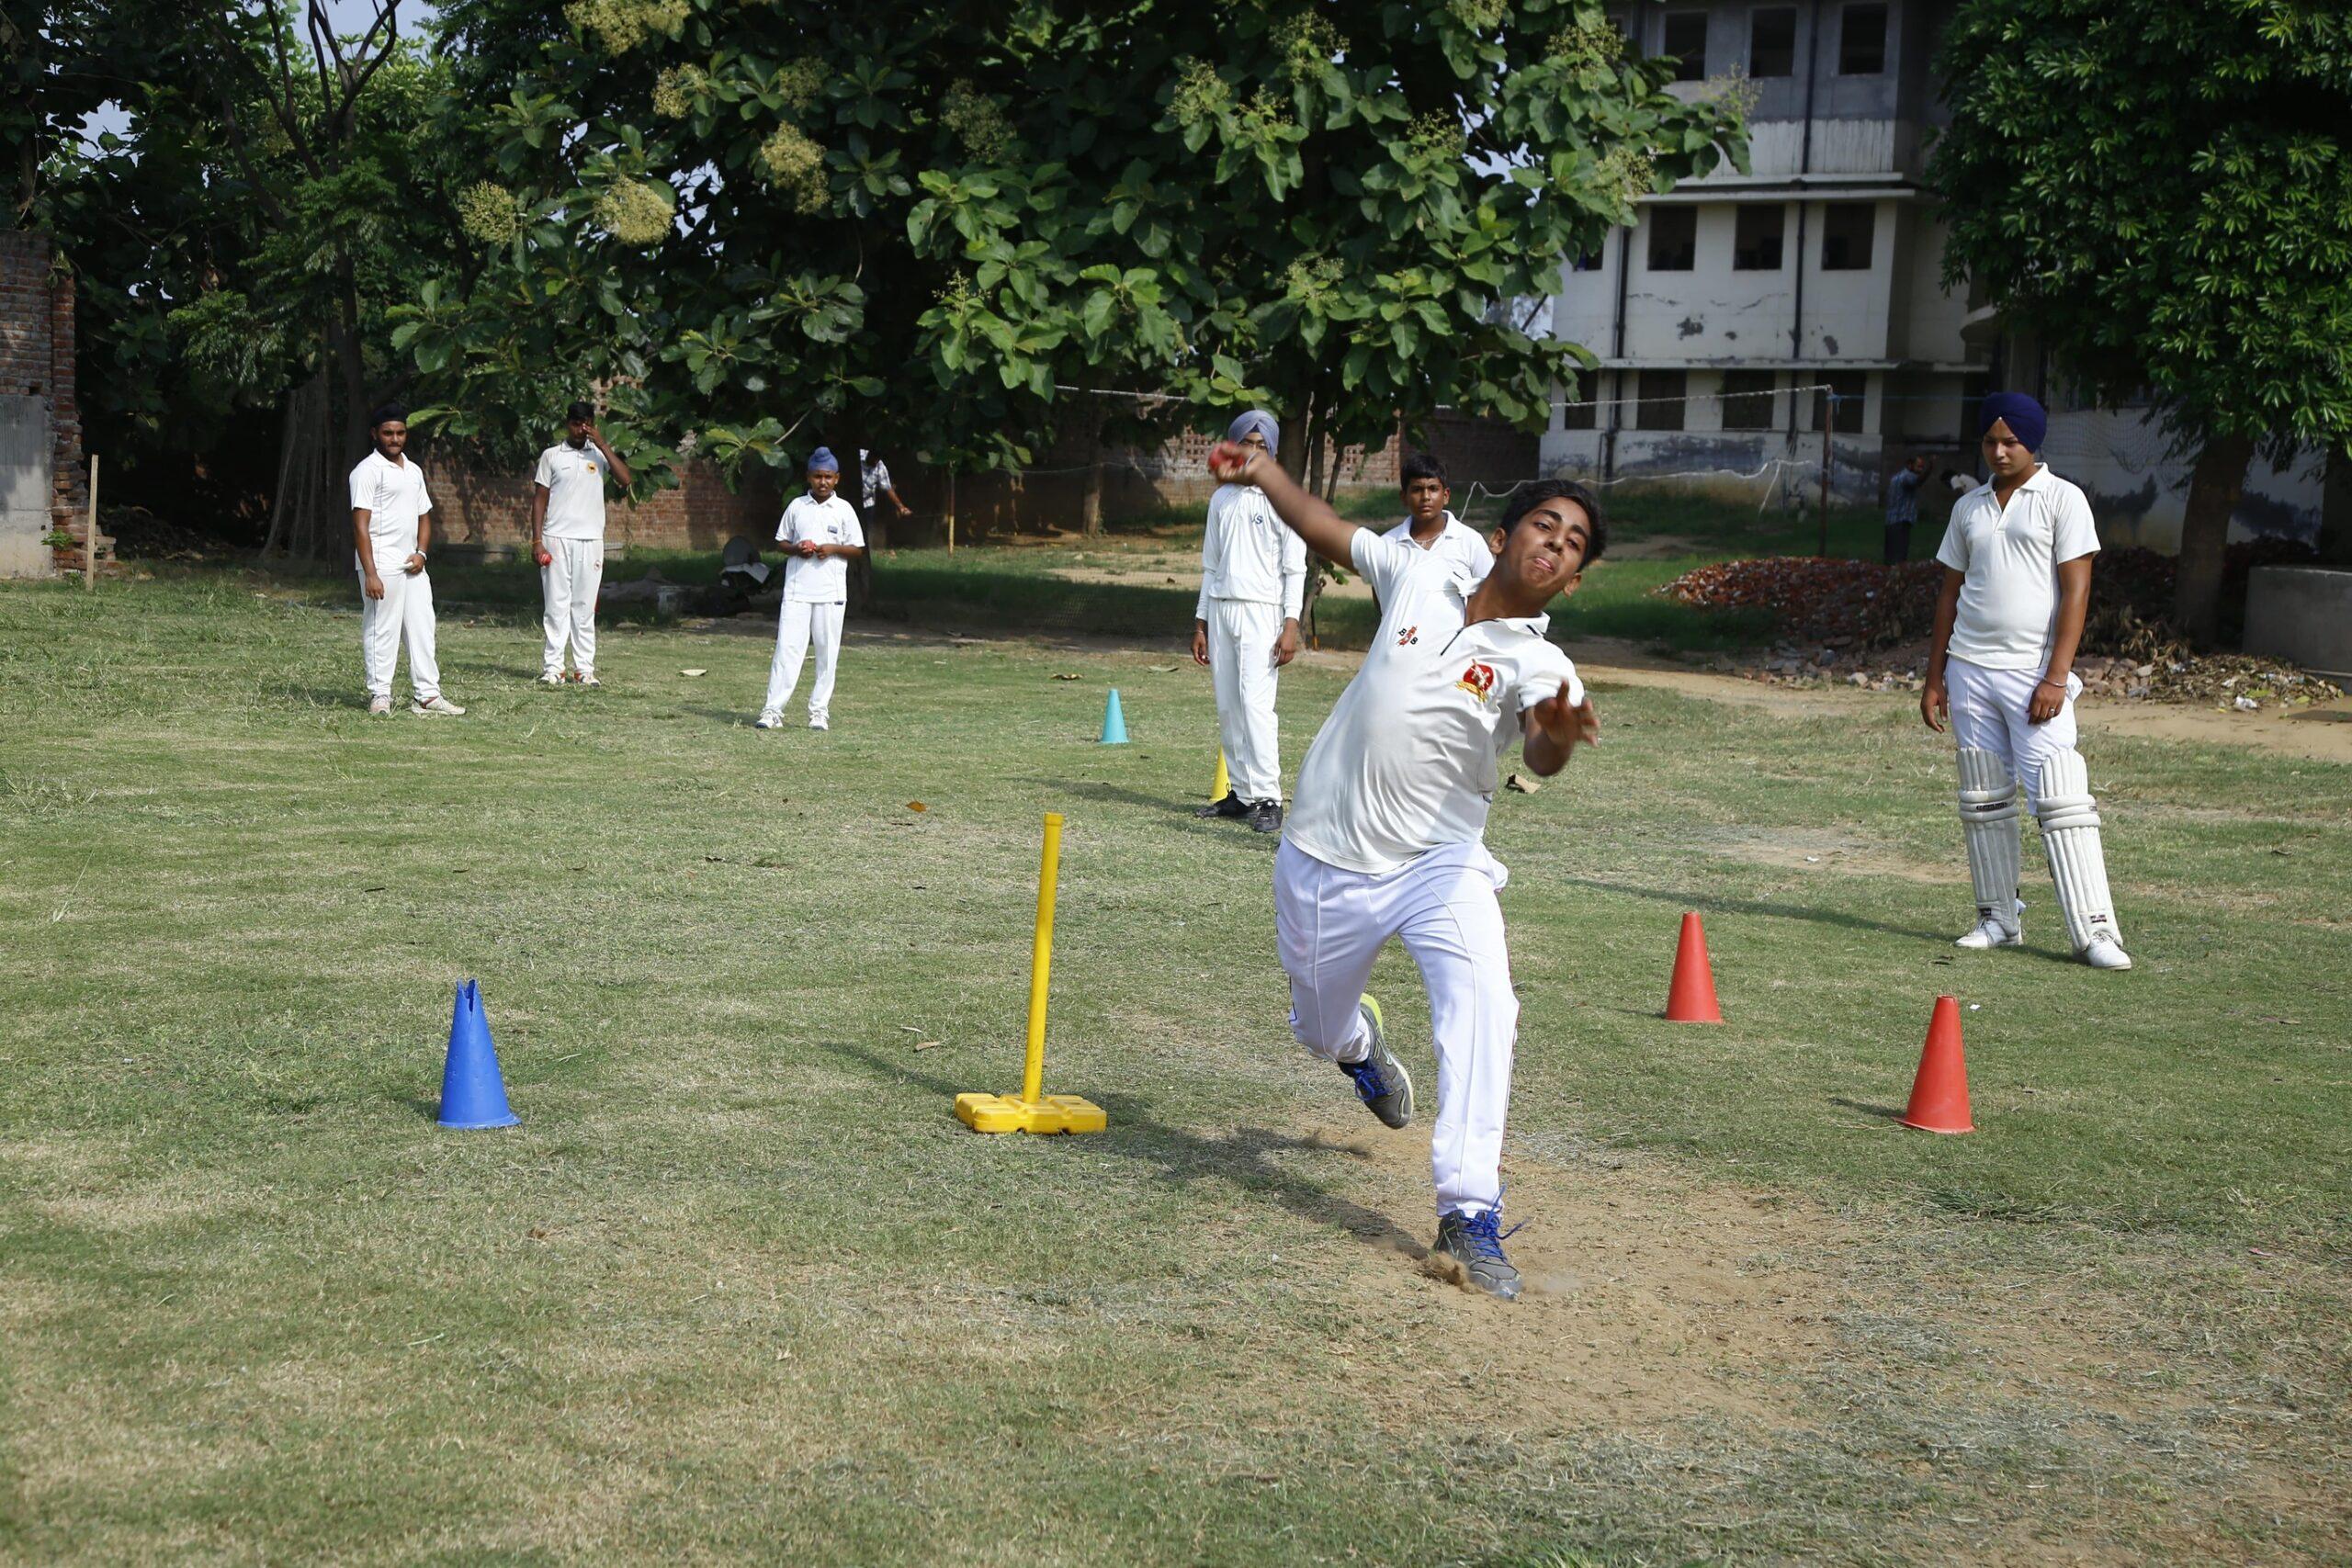 Balling Practice at School Premises